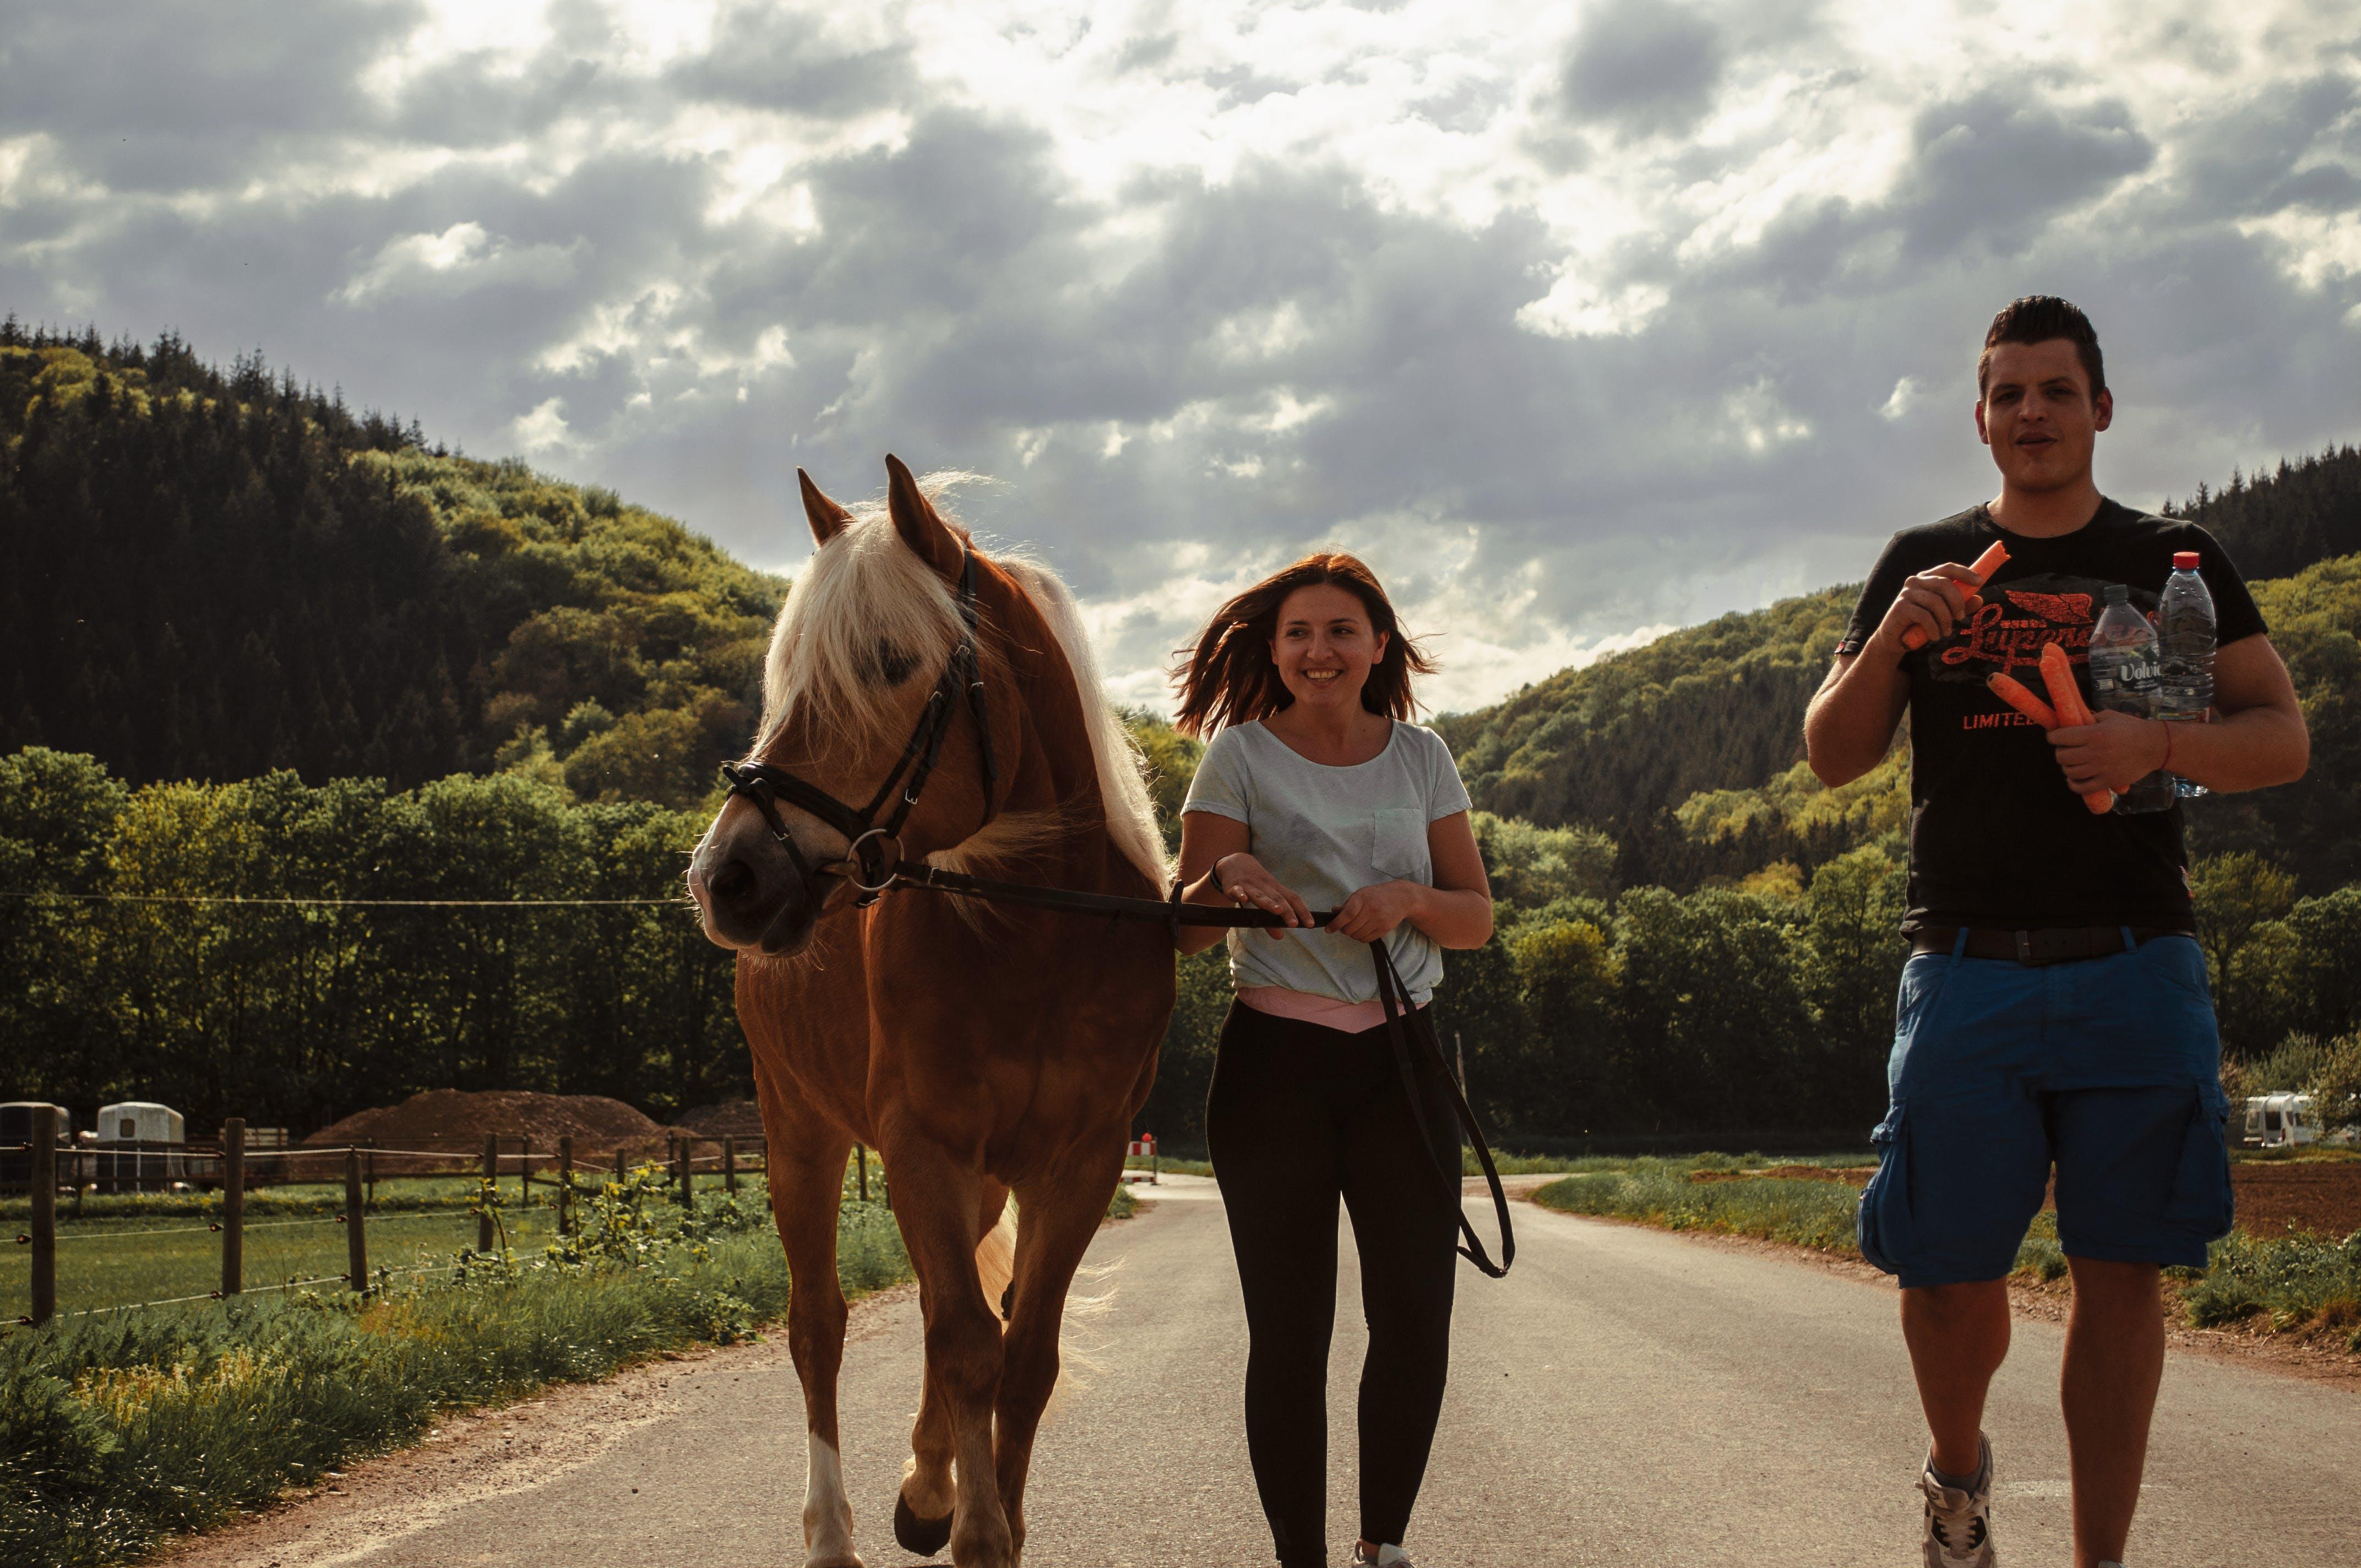 Woman Walking Between Horse and a Man